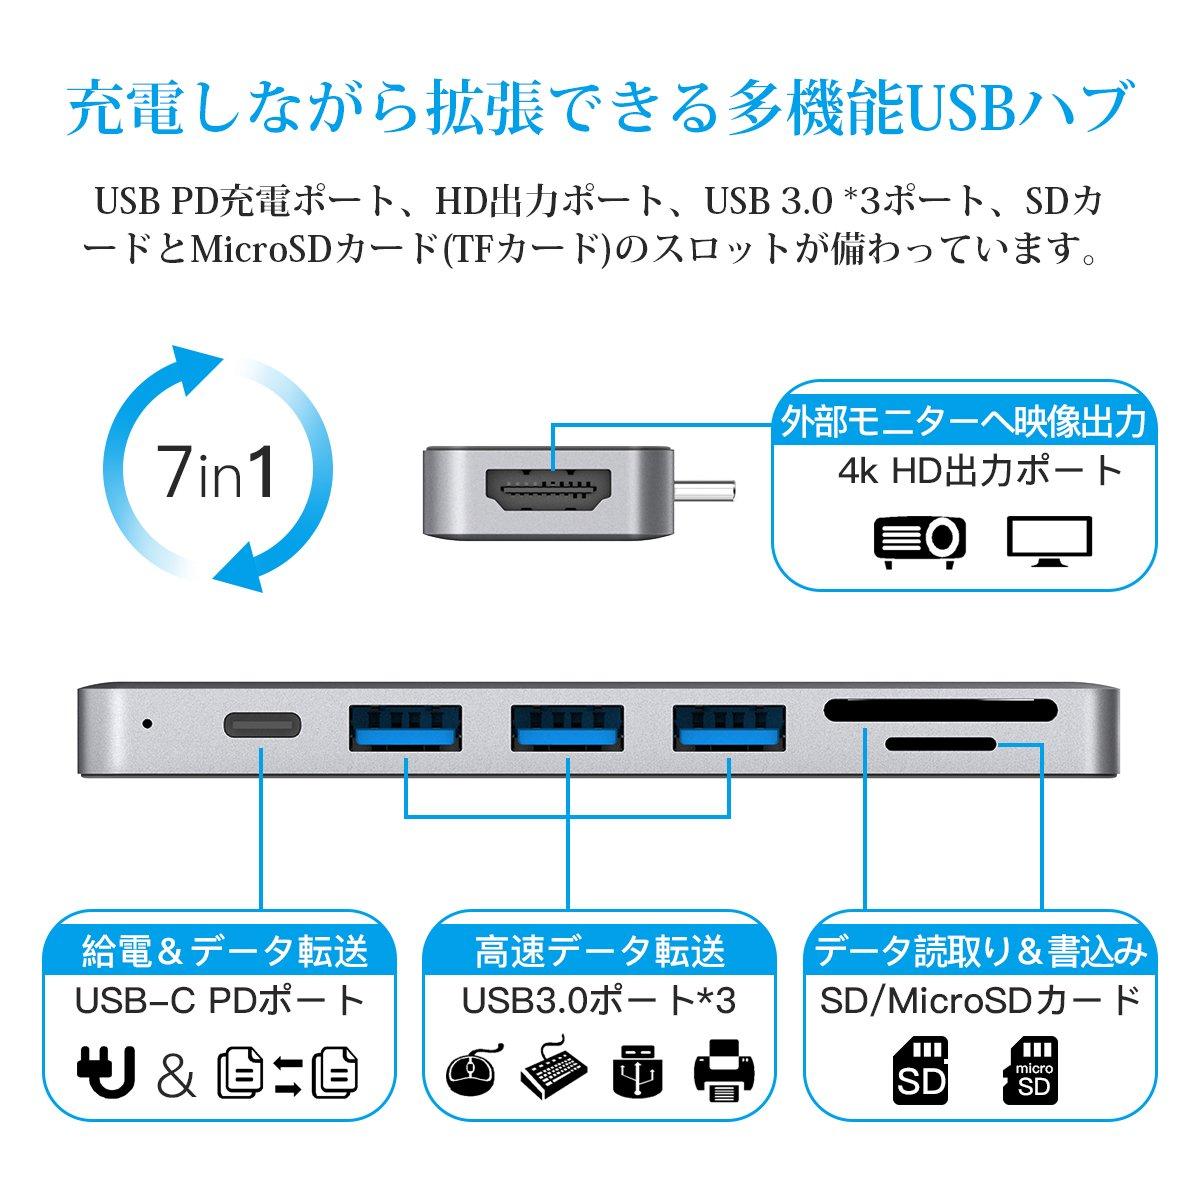 Amazon.co.jp: USB Cハブ USB C...